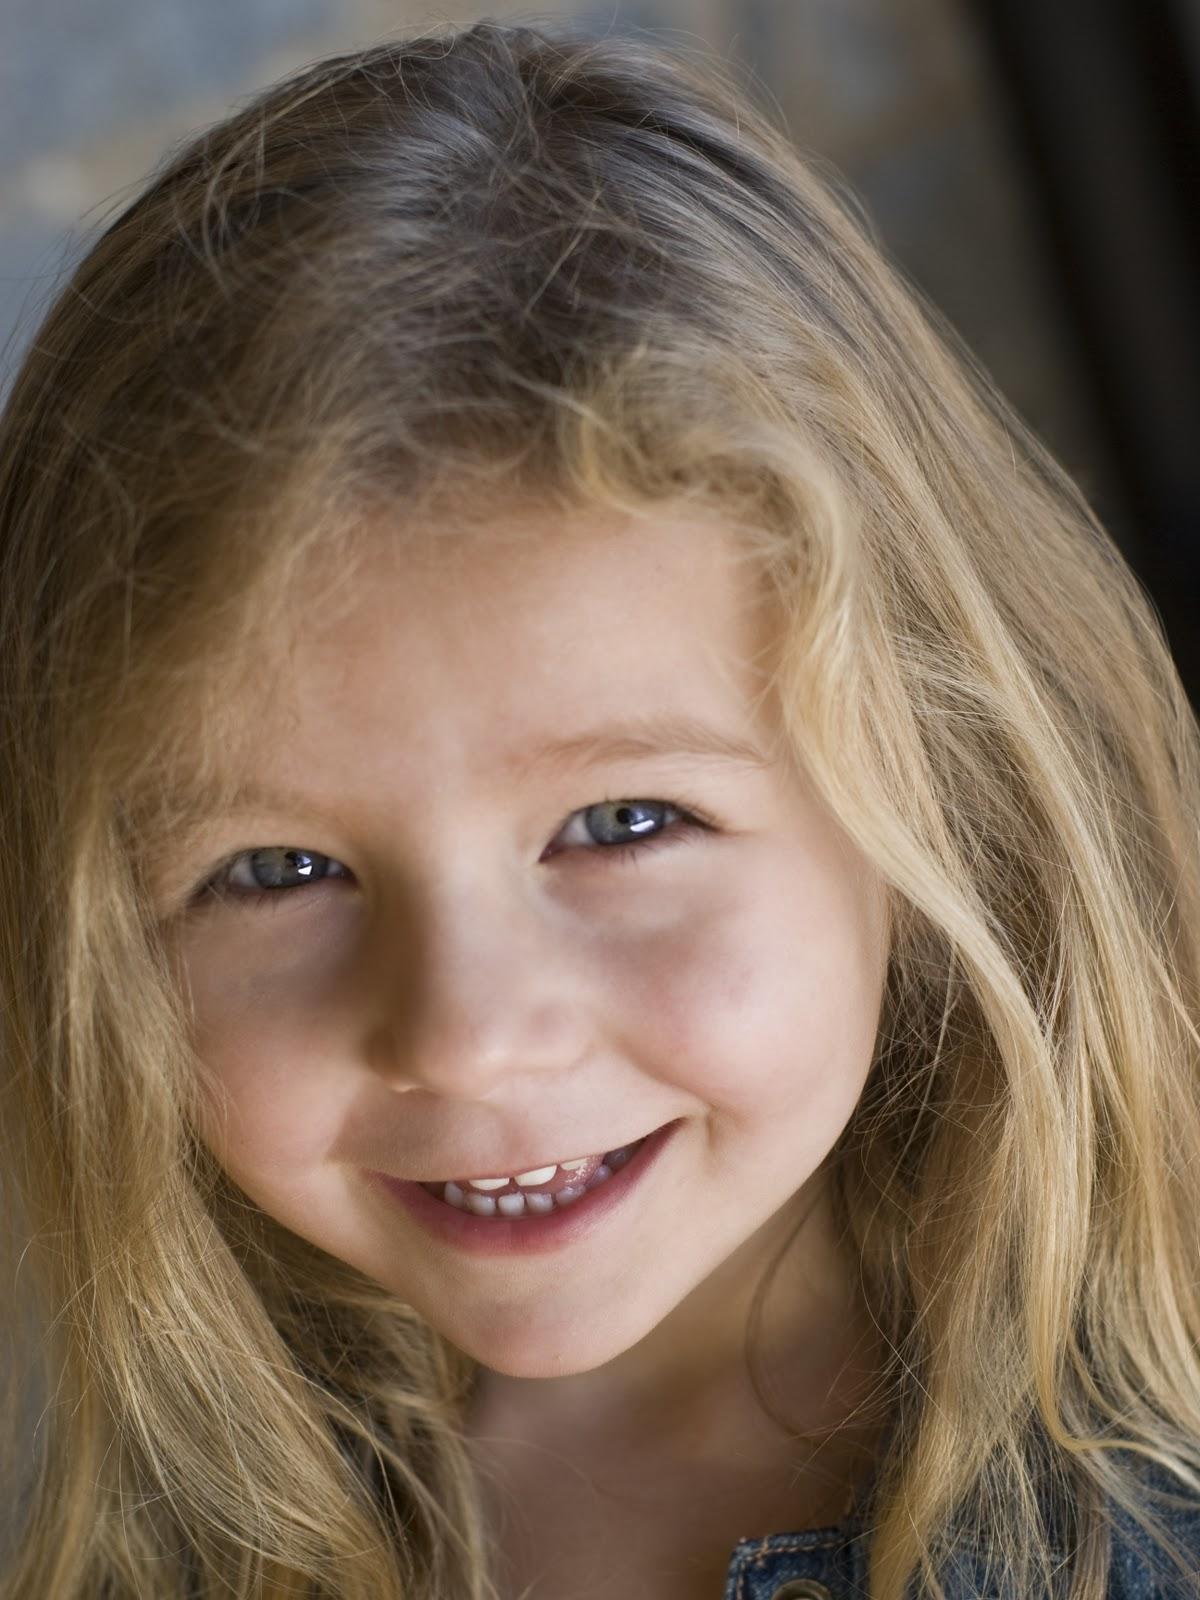 imgChili Little Girl Models